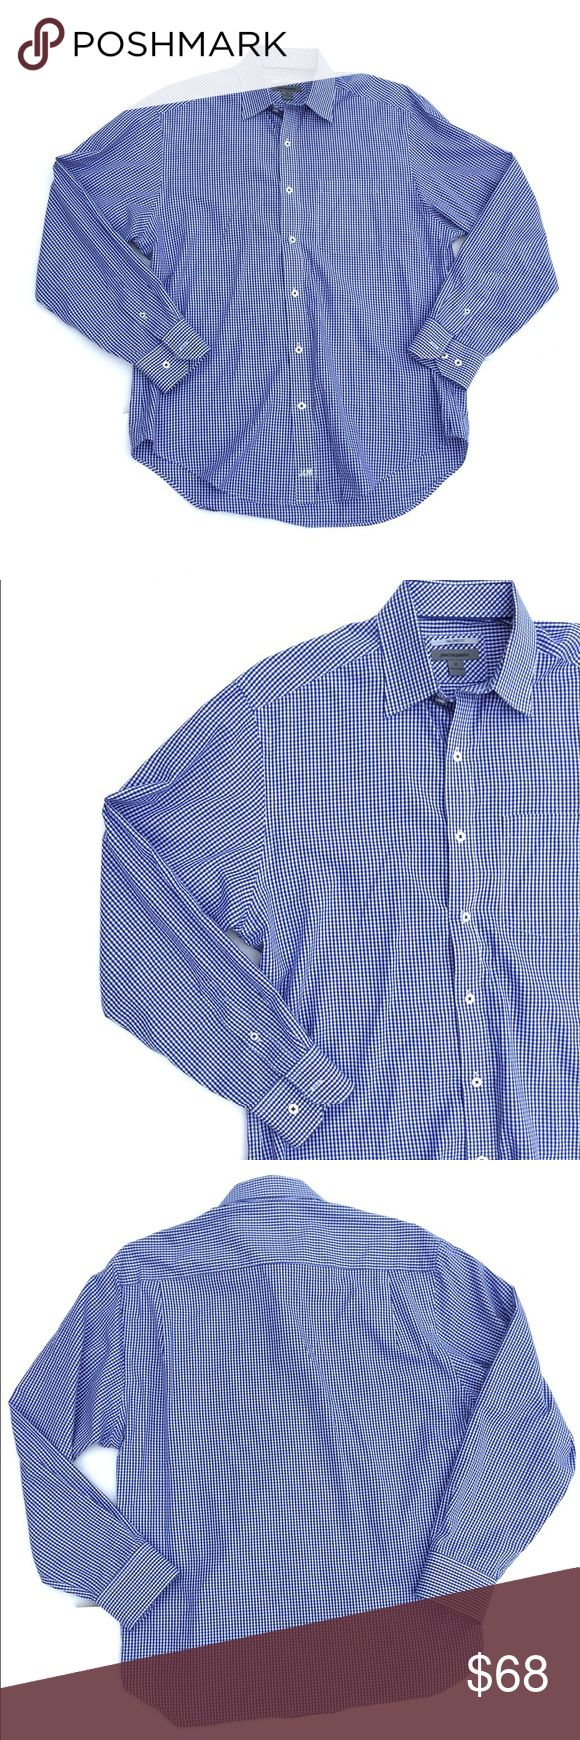 Johnston and Murphy blue gingham button down Johnston and Murphy blue gingham button down.  Like new, never worn. Tailored fit. Johnston & Murphy Shirts Dress Shirts